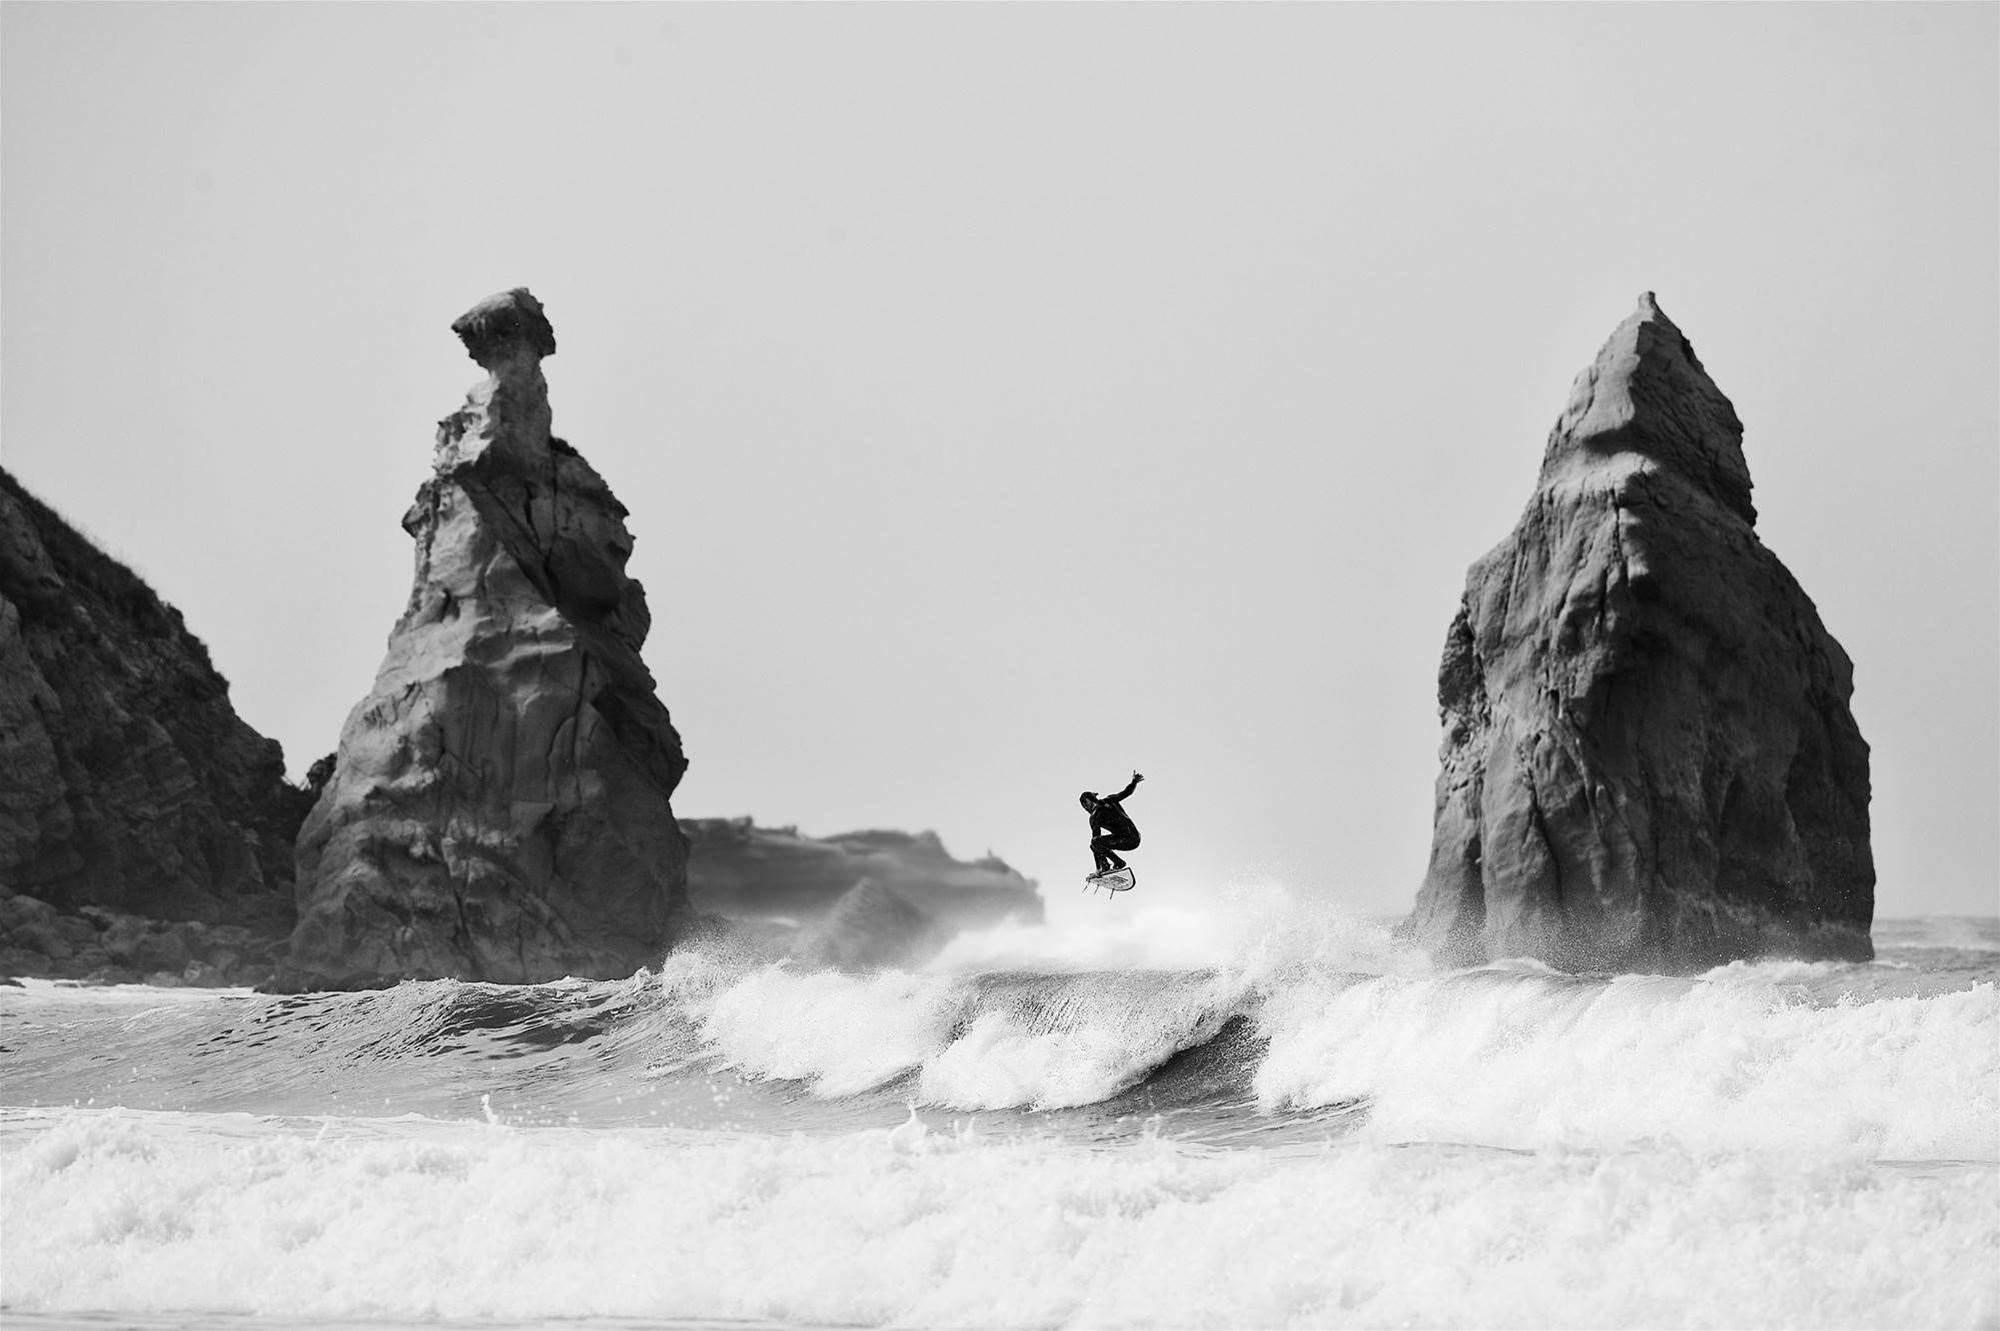 SALT AWARDS – WINNER – SURF PHOTOGRAPHER OF THE YEAR